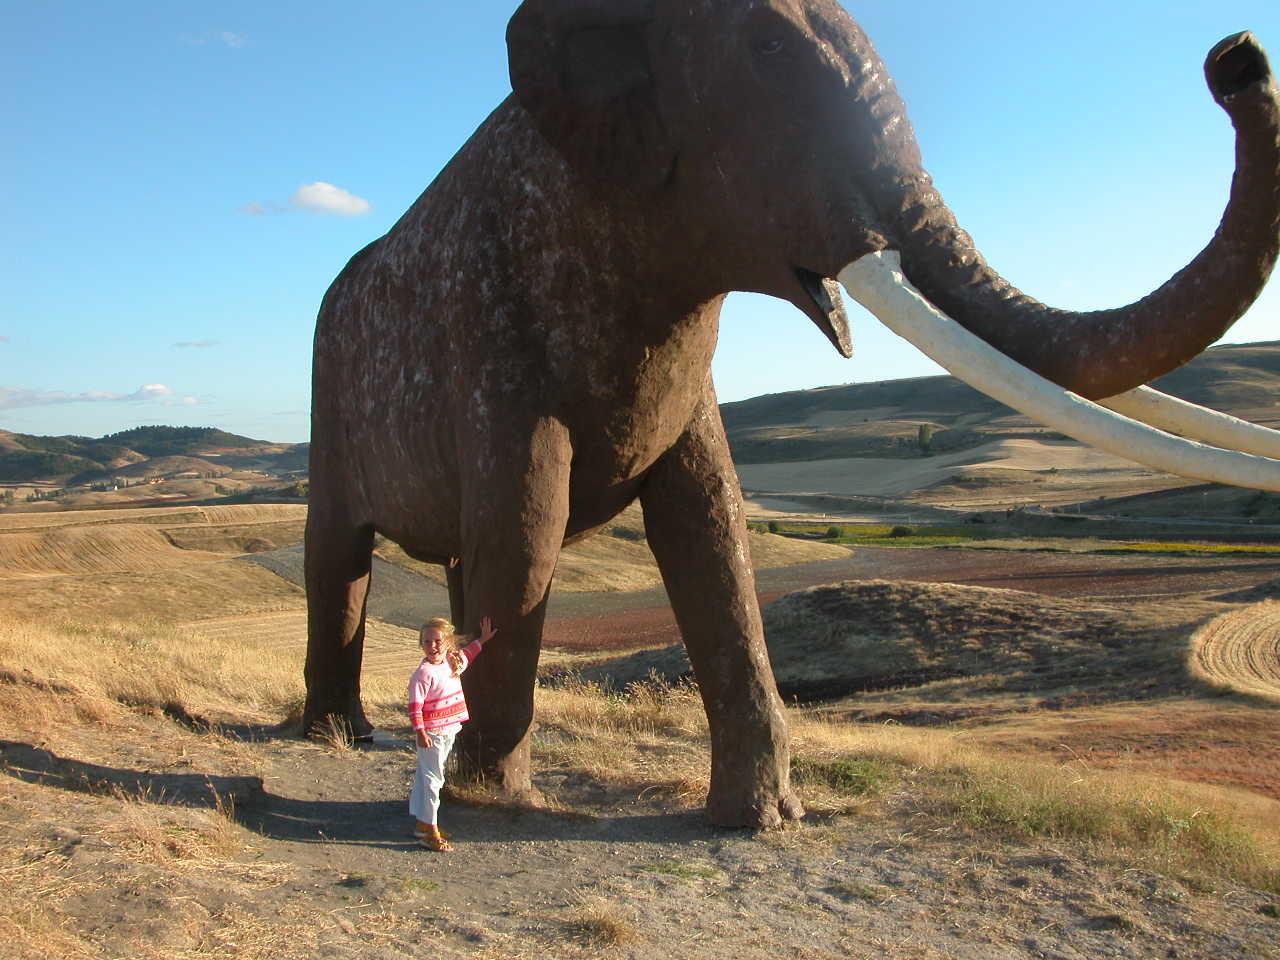 File:Elephas Antiquus Ambrona.jpg - Wikimedia Commons